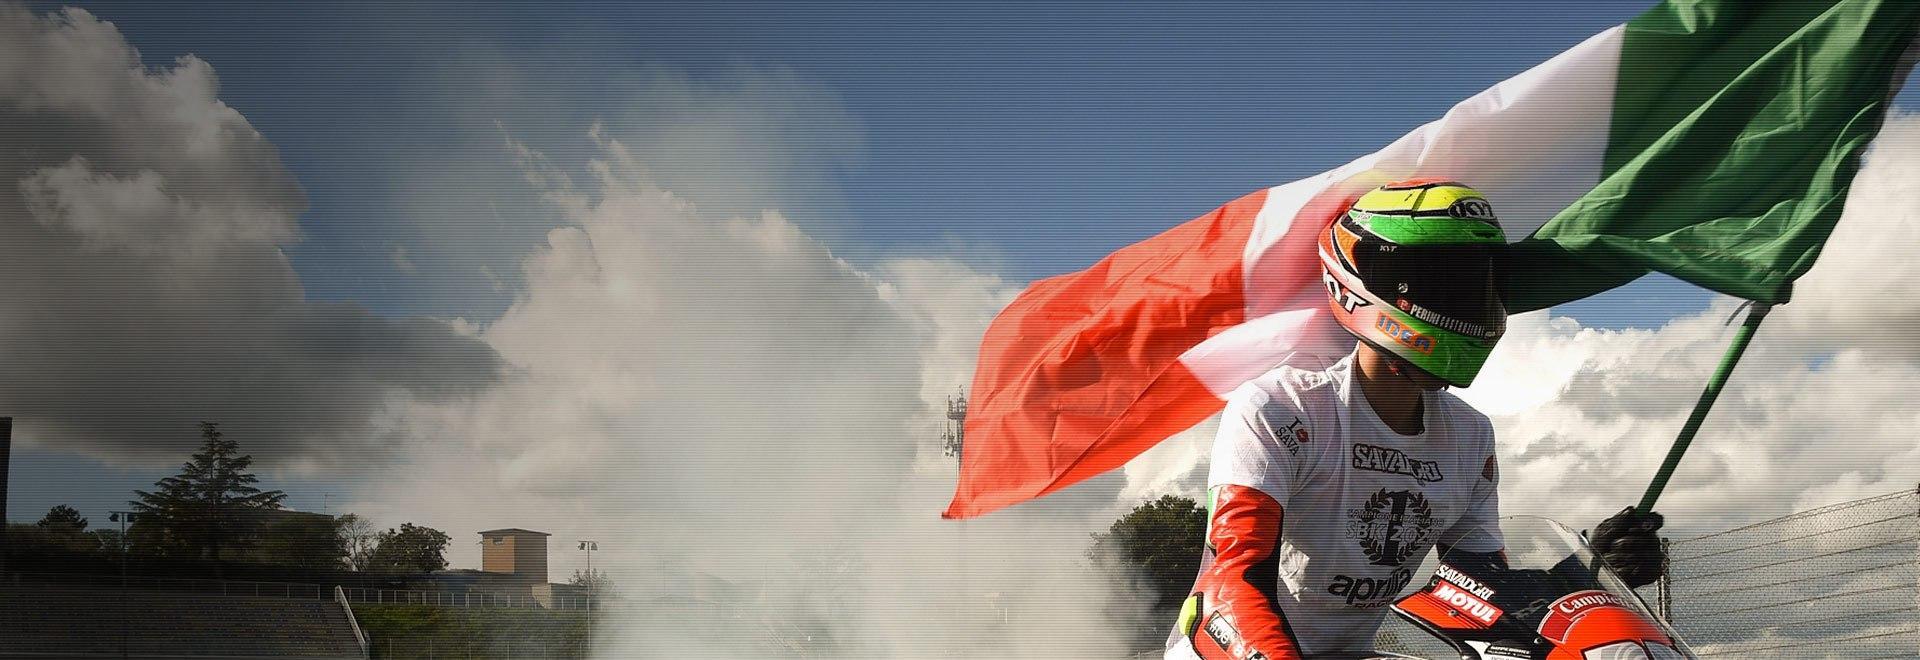 GP Mugello: Supersport. Race 2